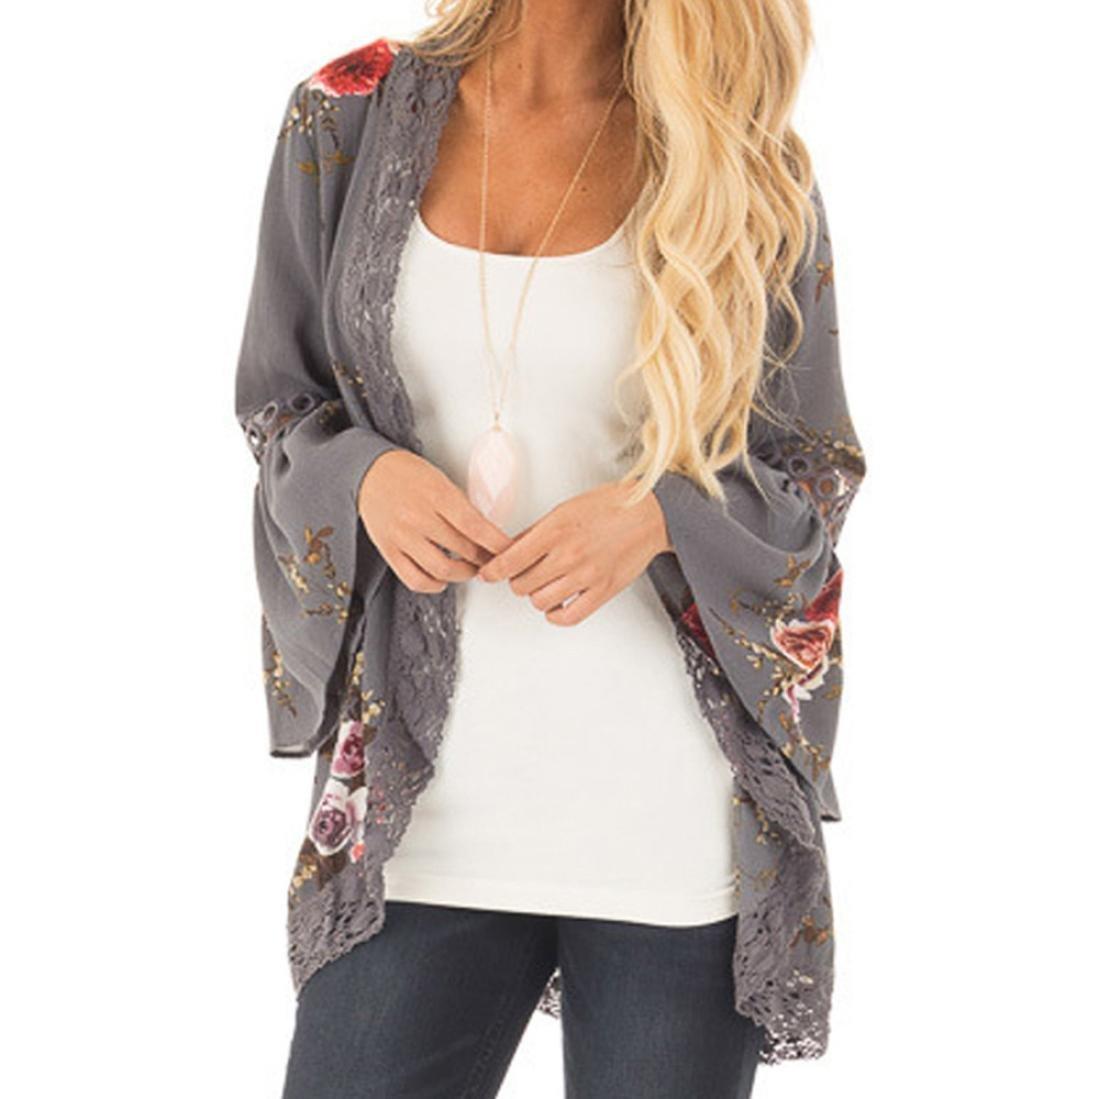 Amazon.com: Teresamoon Womens Floral Print Sheer Lace Loose Kimono Jacket Cardigan: Kitchen & Dining